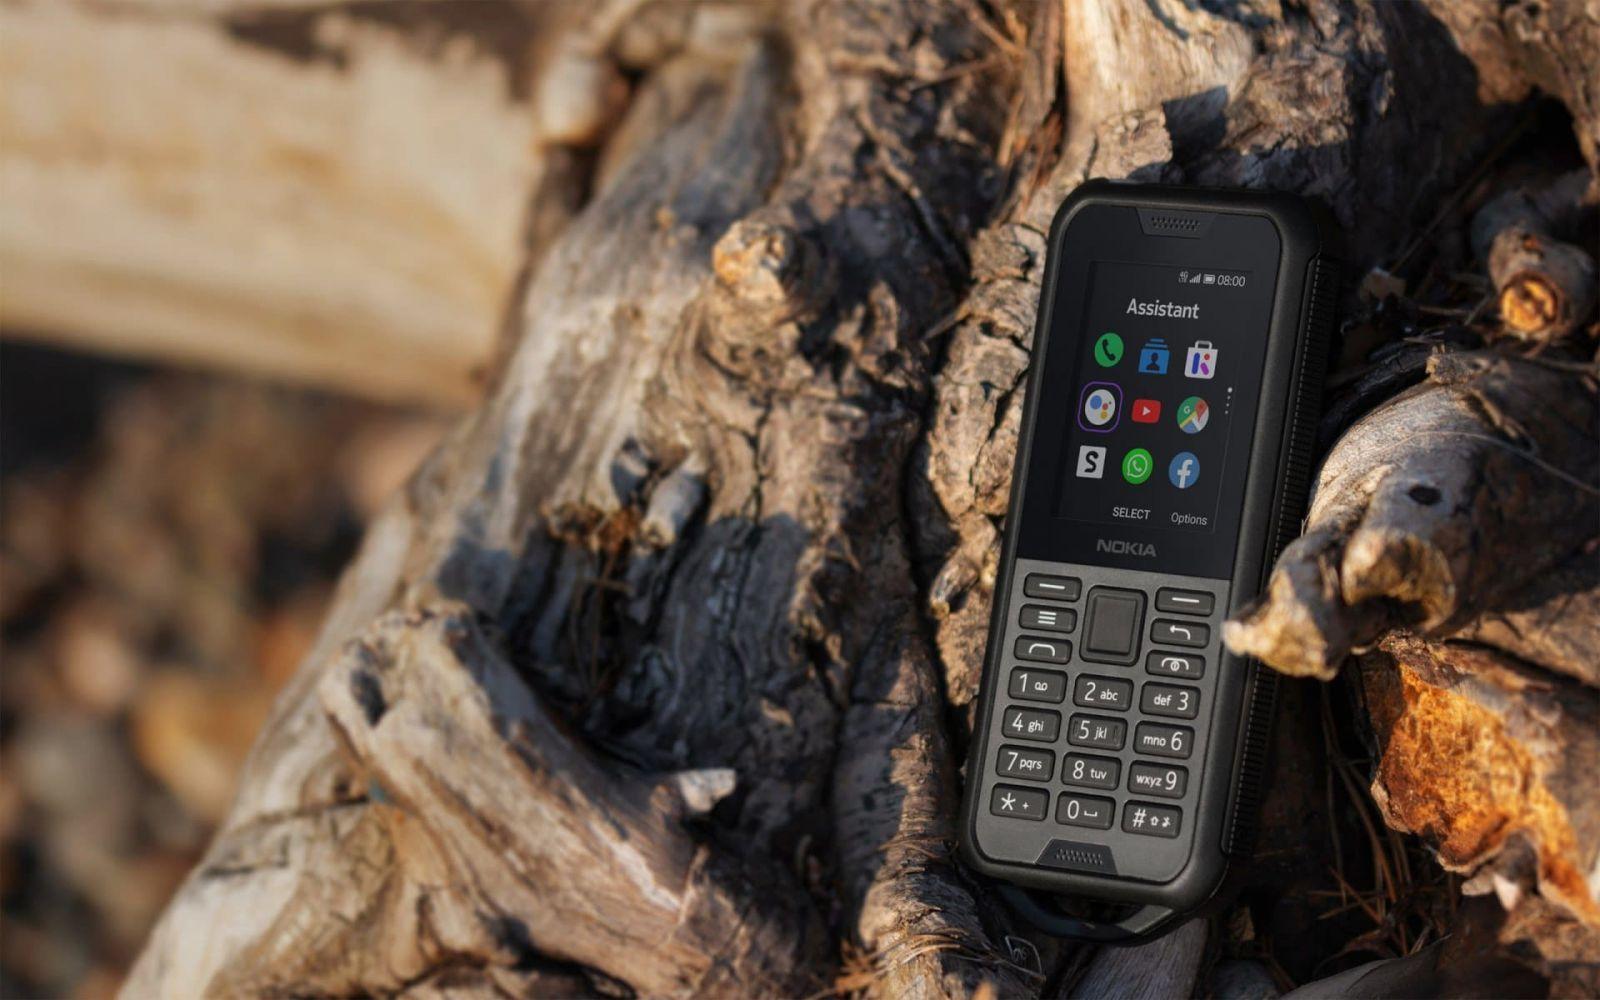 Nokia открыла предзаказ на новые смартфоны (nokia 800 hero desktop)